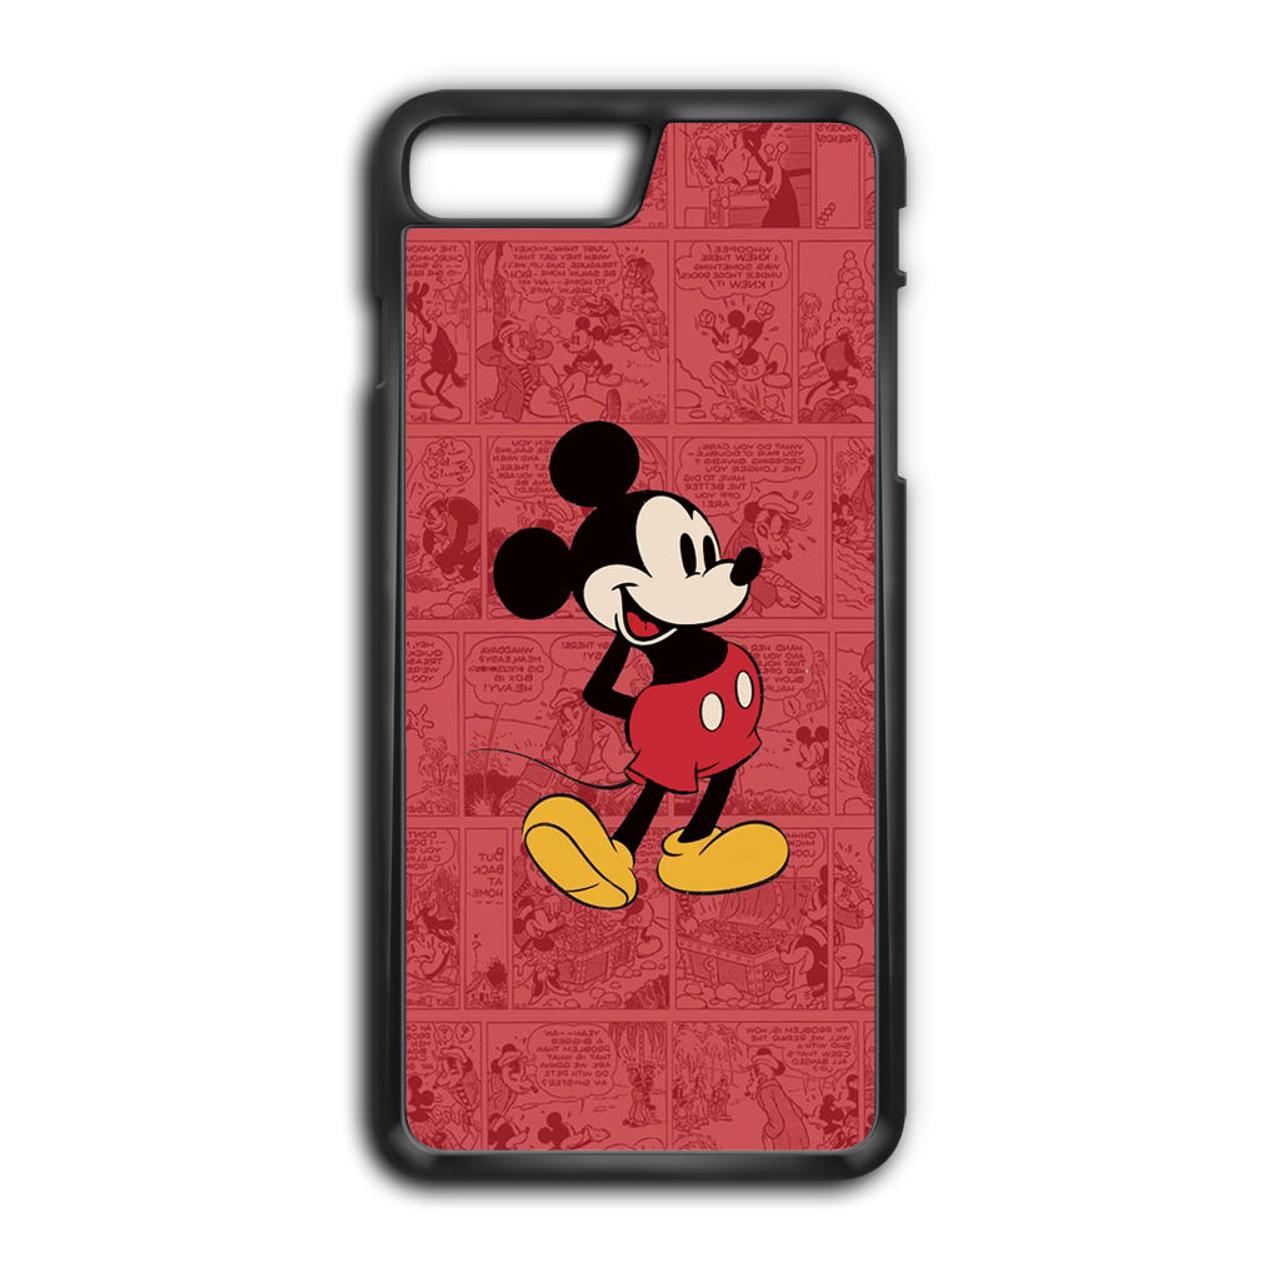 cheaper 0ba7d 526ca Mickey Mouse Black iPhone 8 Plus Case